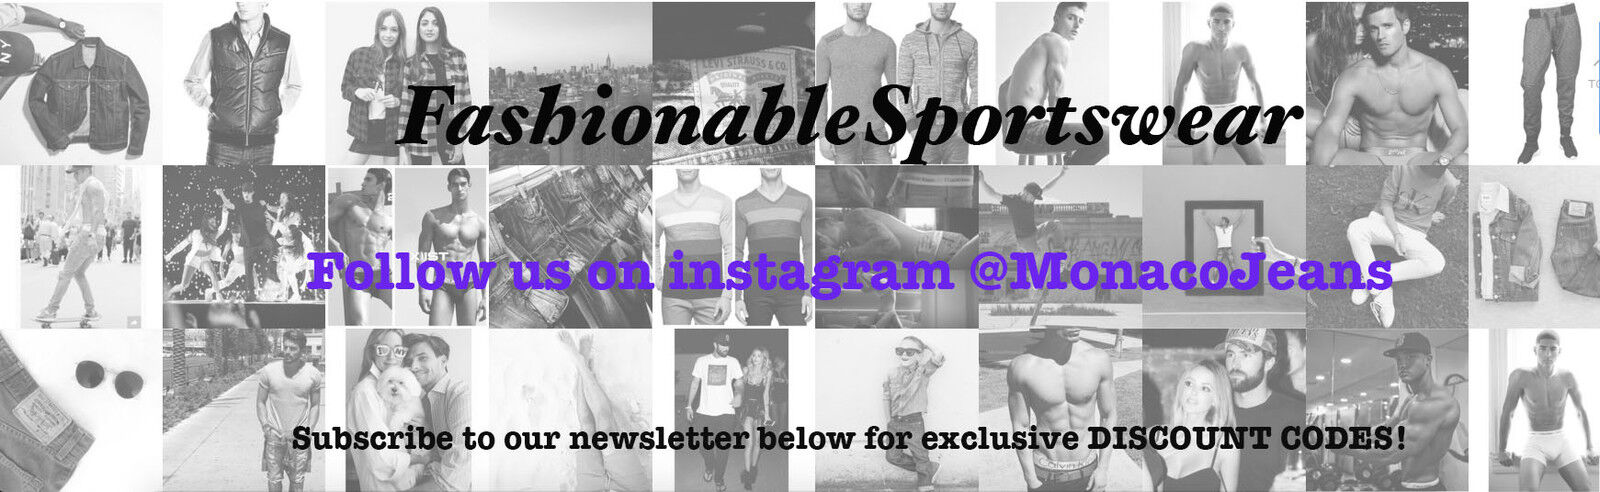 Fashionable Sportswear